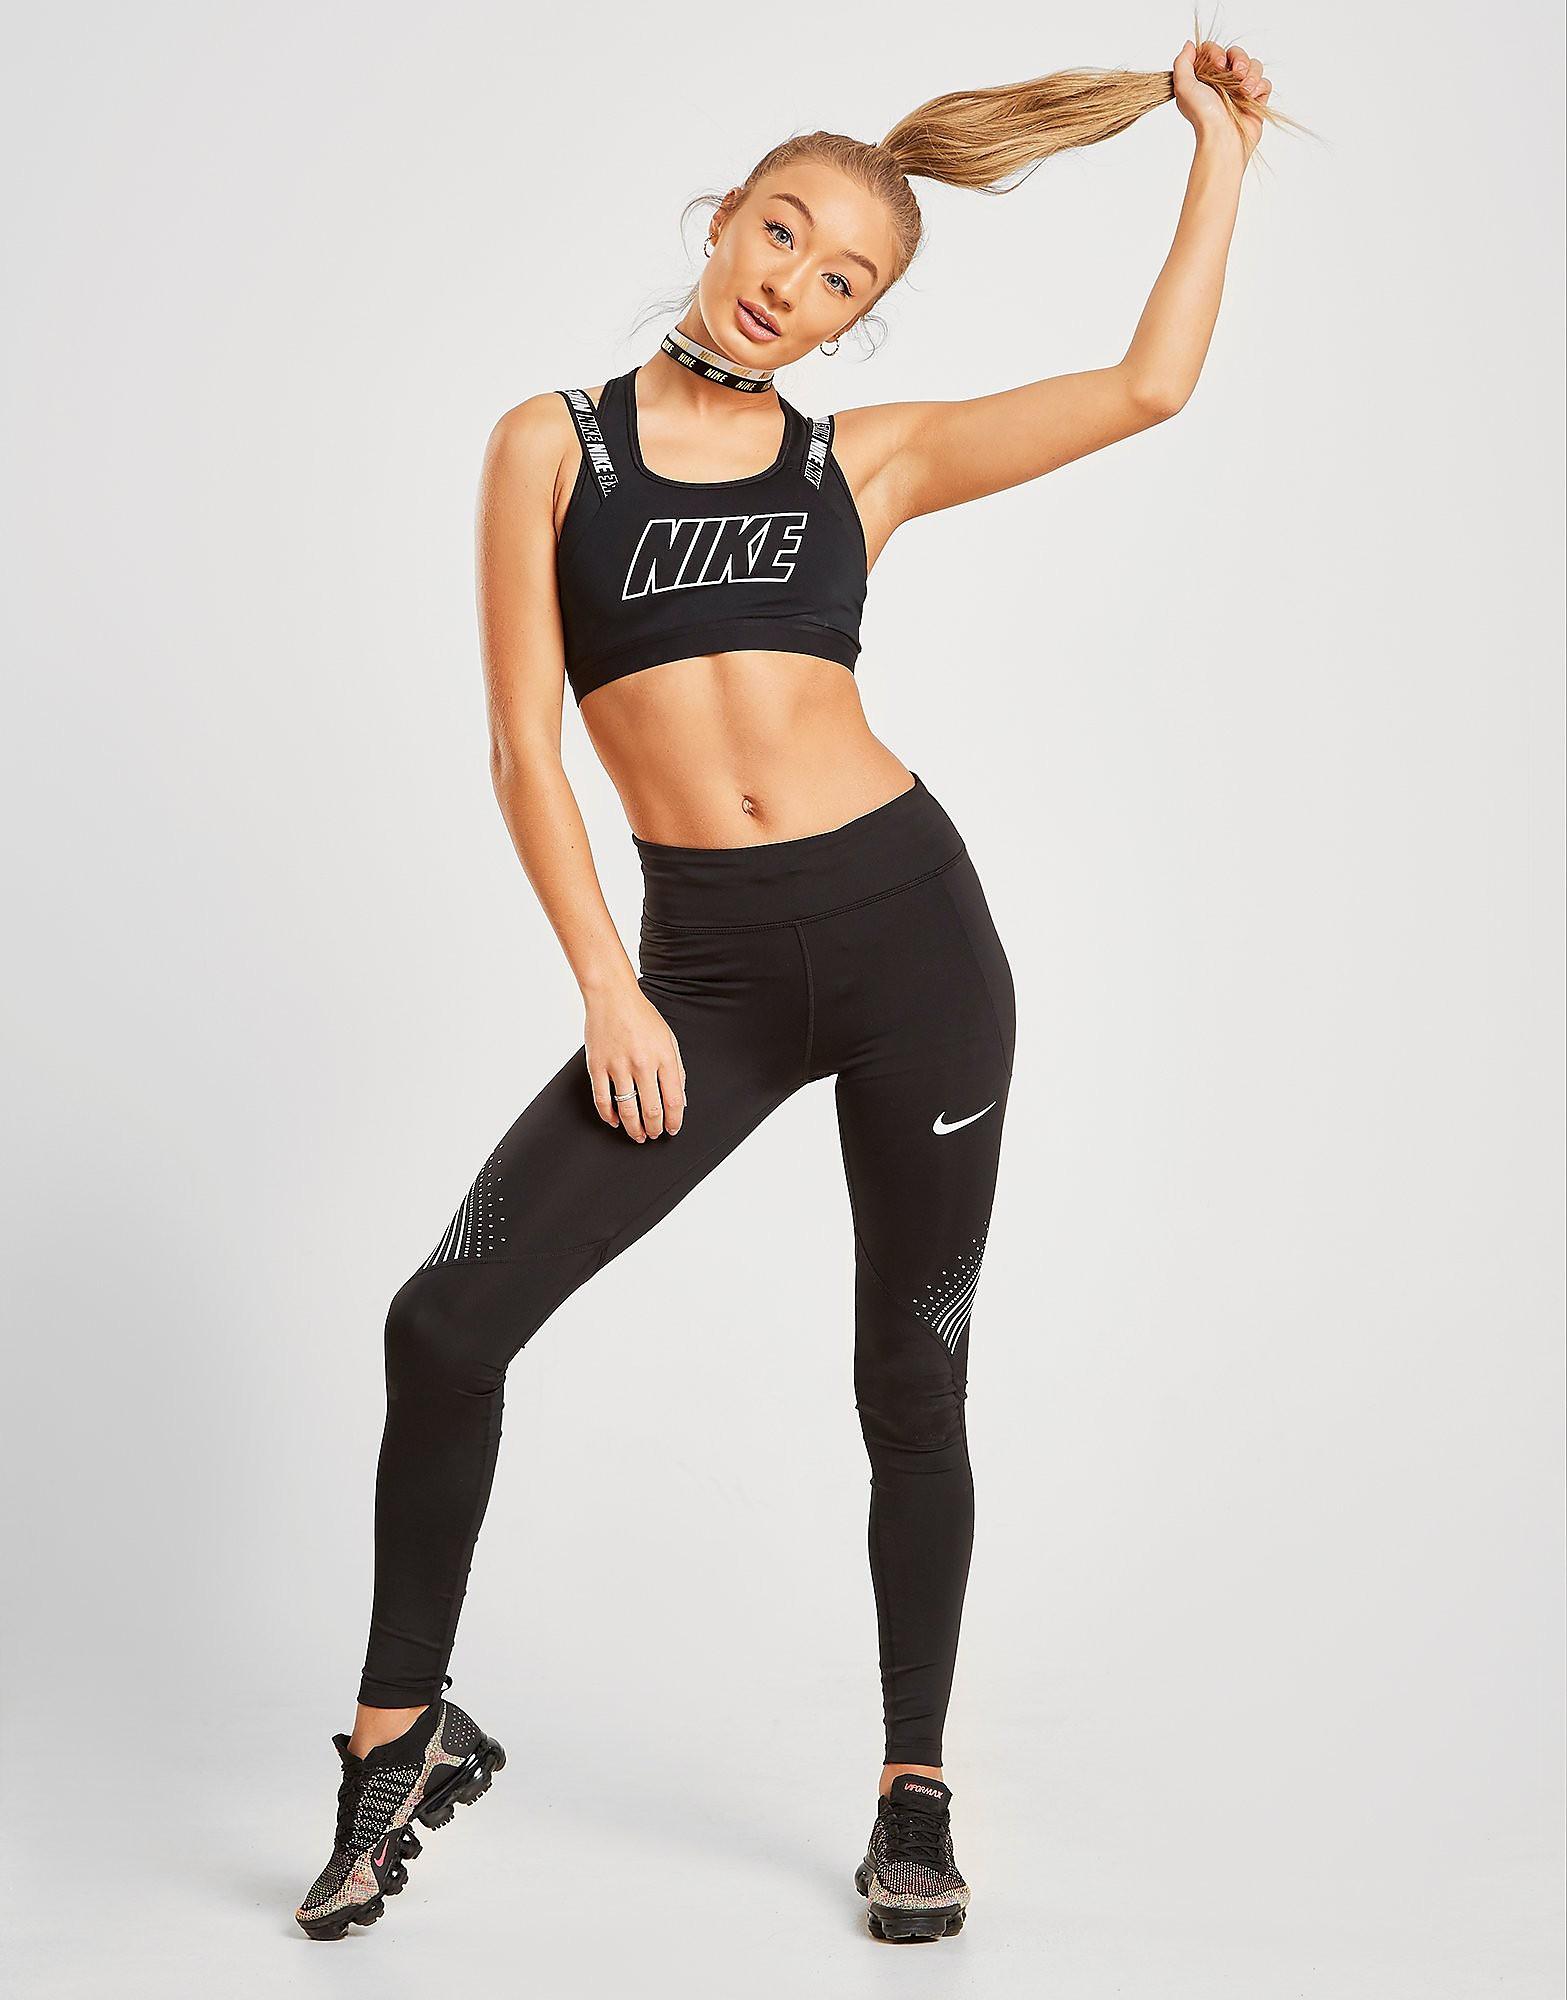 Nike Running Leggins Damen - Schwarz - Womens, Schwarz